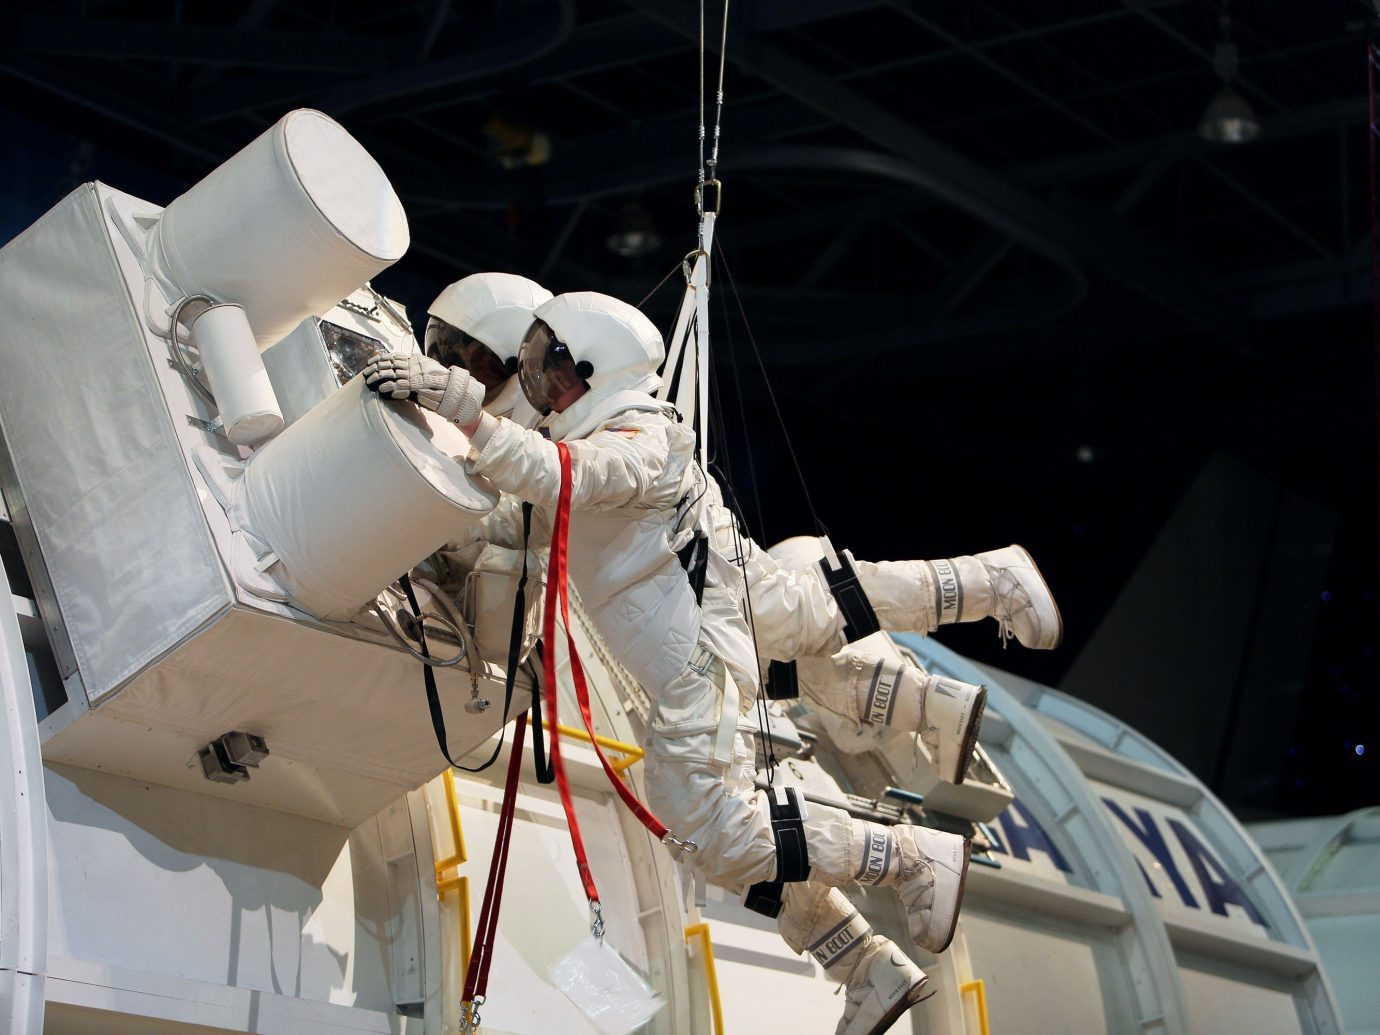 Trip Ideas astronaut white machine vehicle space robot tourist attraction